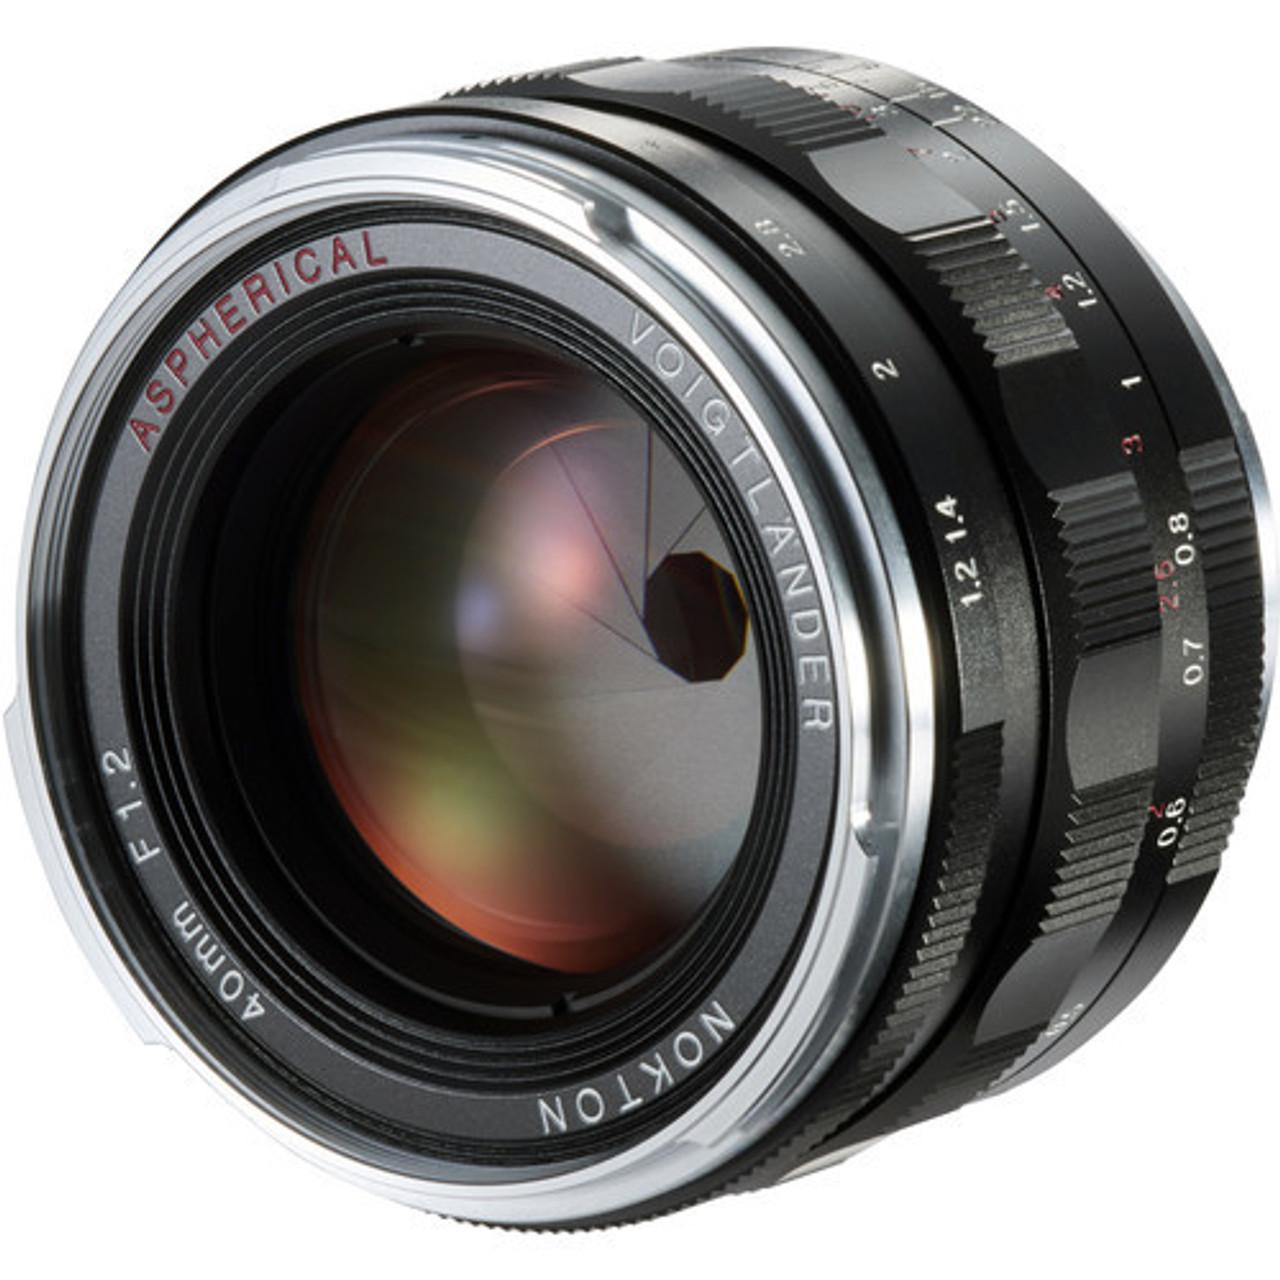 Voigtländer 40mm f/1 2 Nokton Aspherical Lens - Leica M Mount